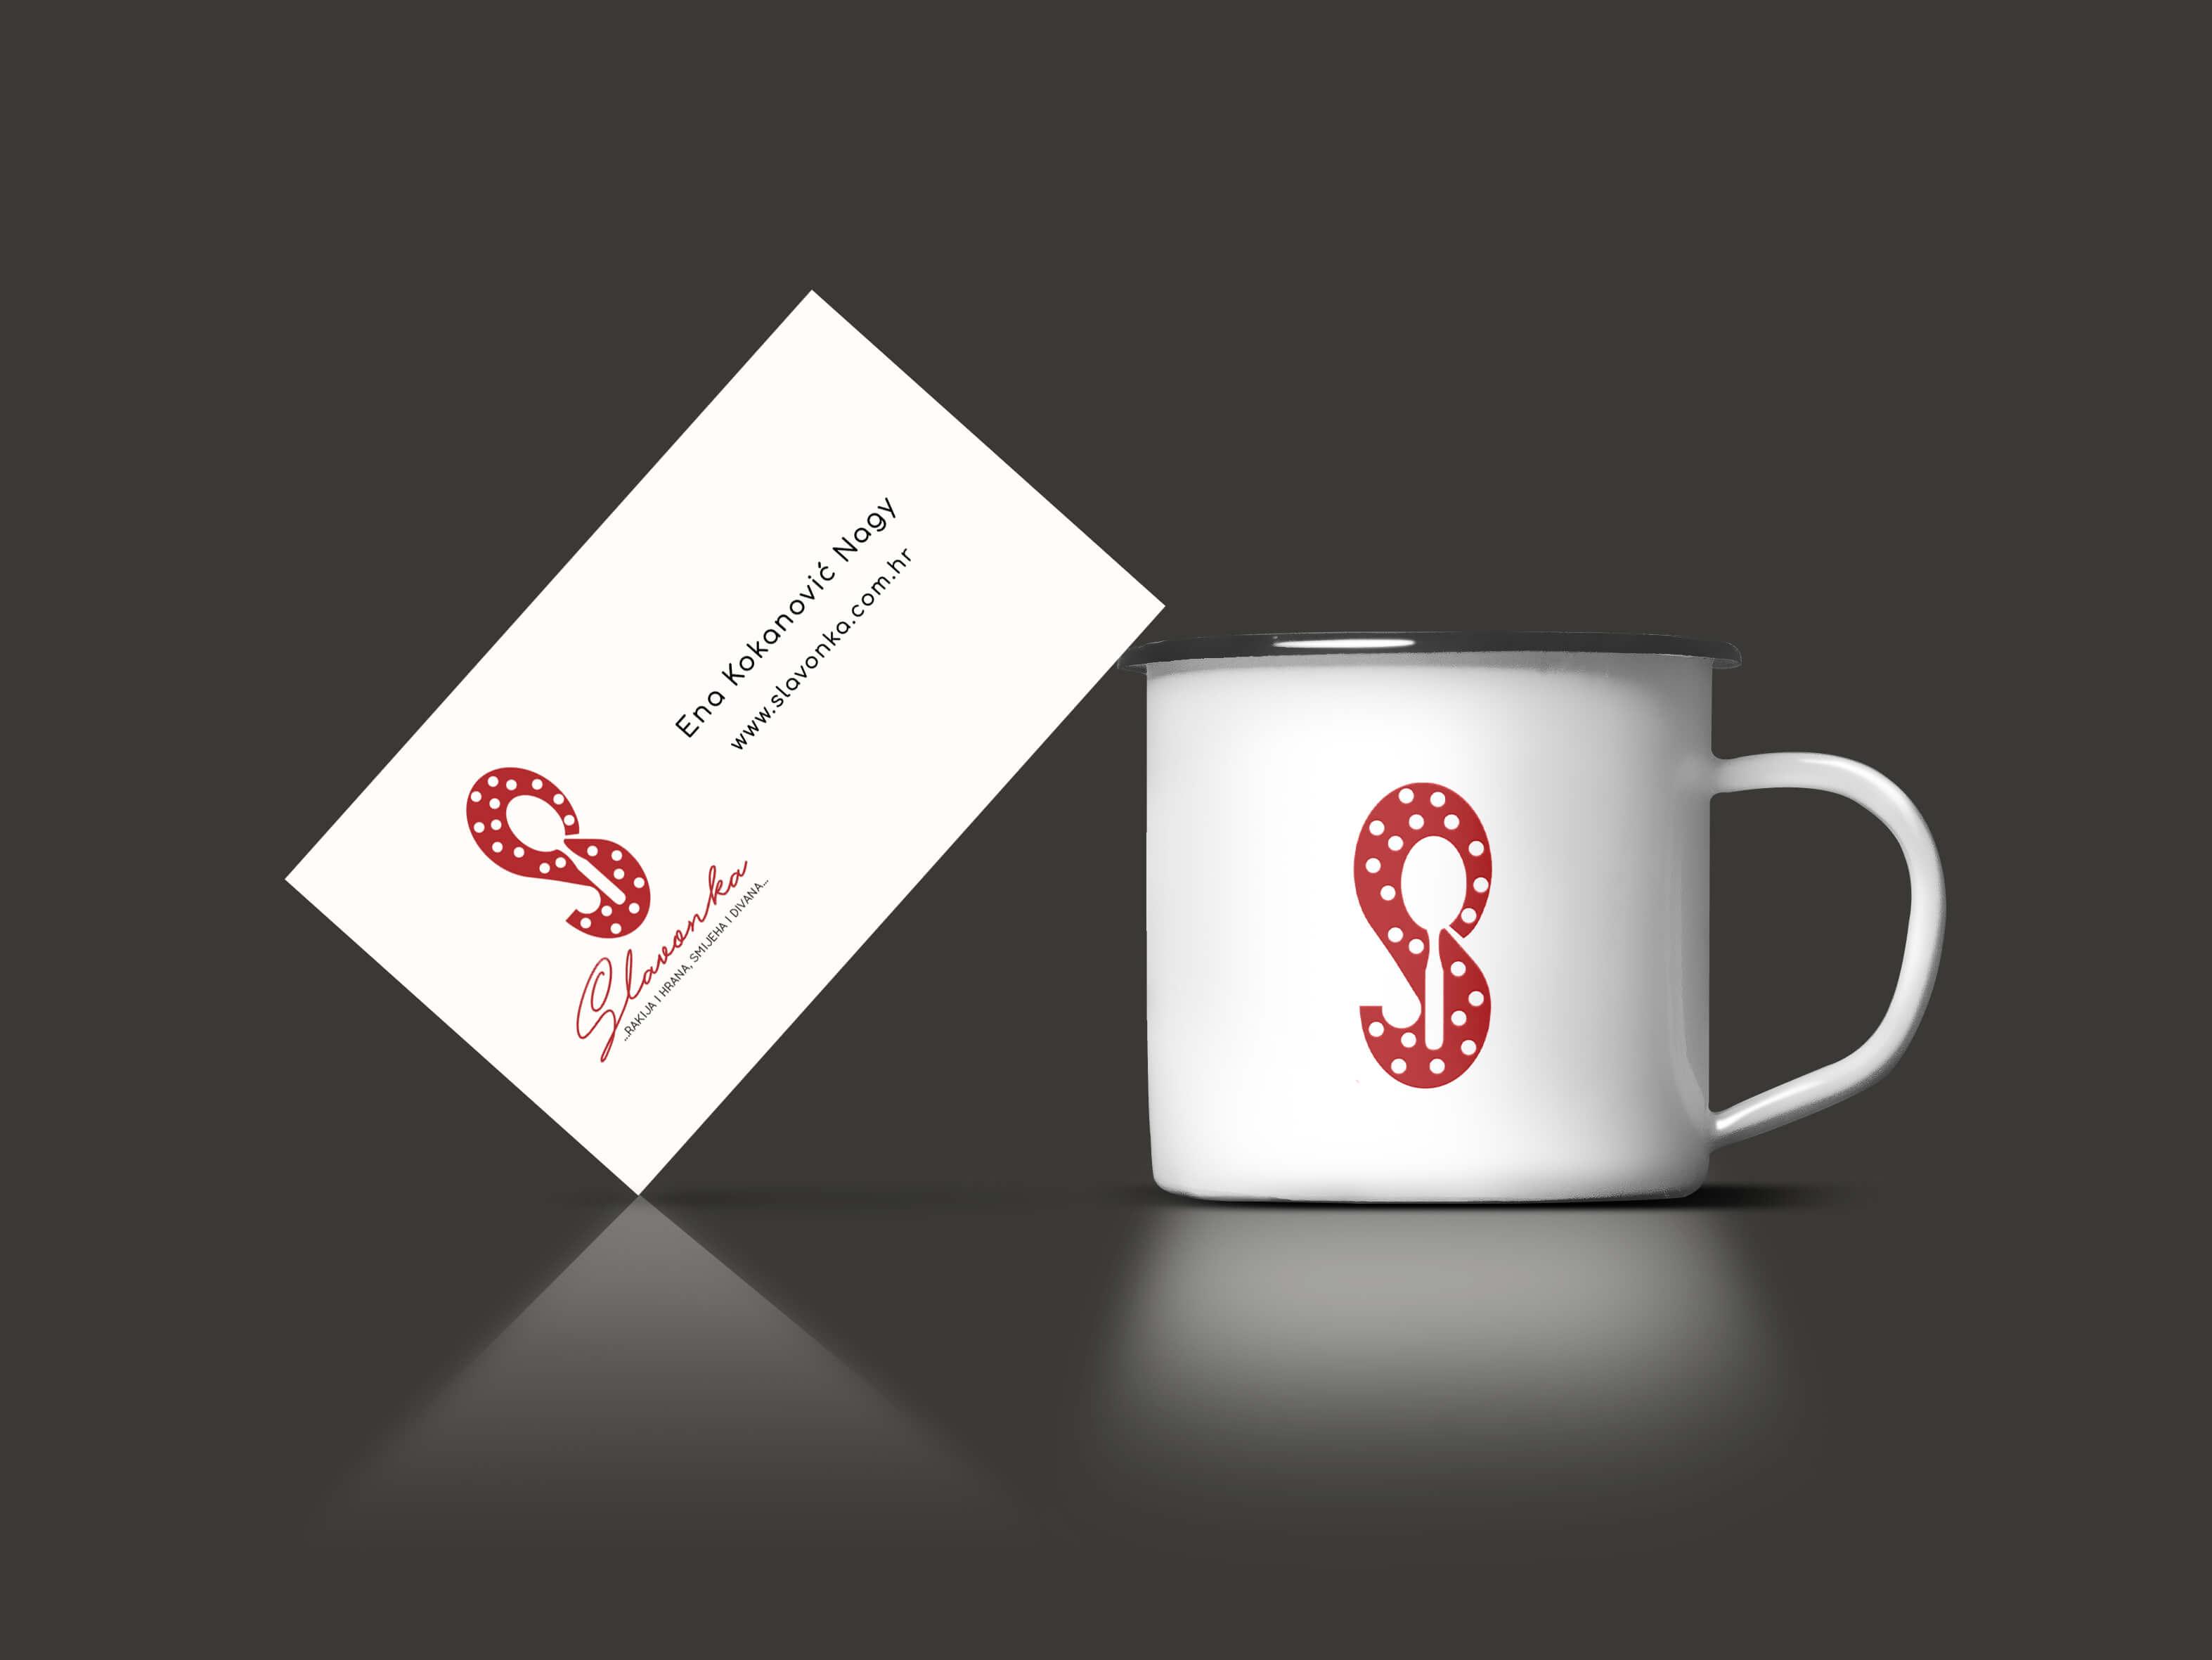 dizajn logotipa i dizajn posjetnice